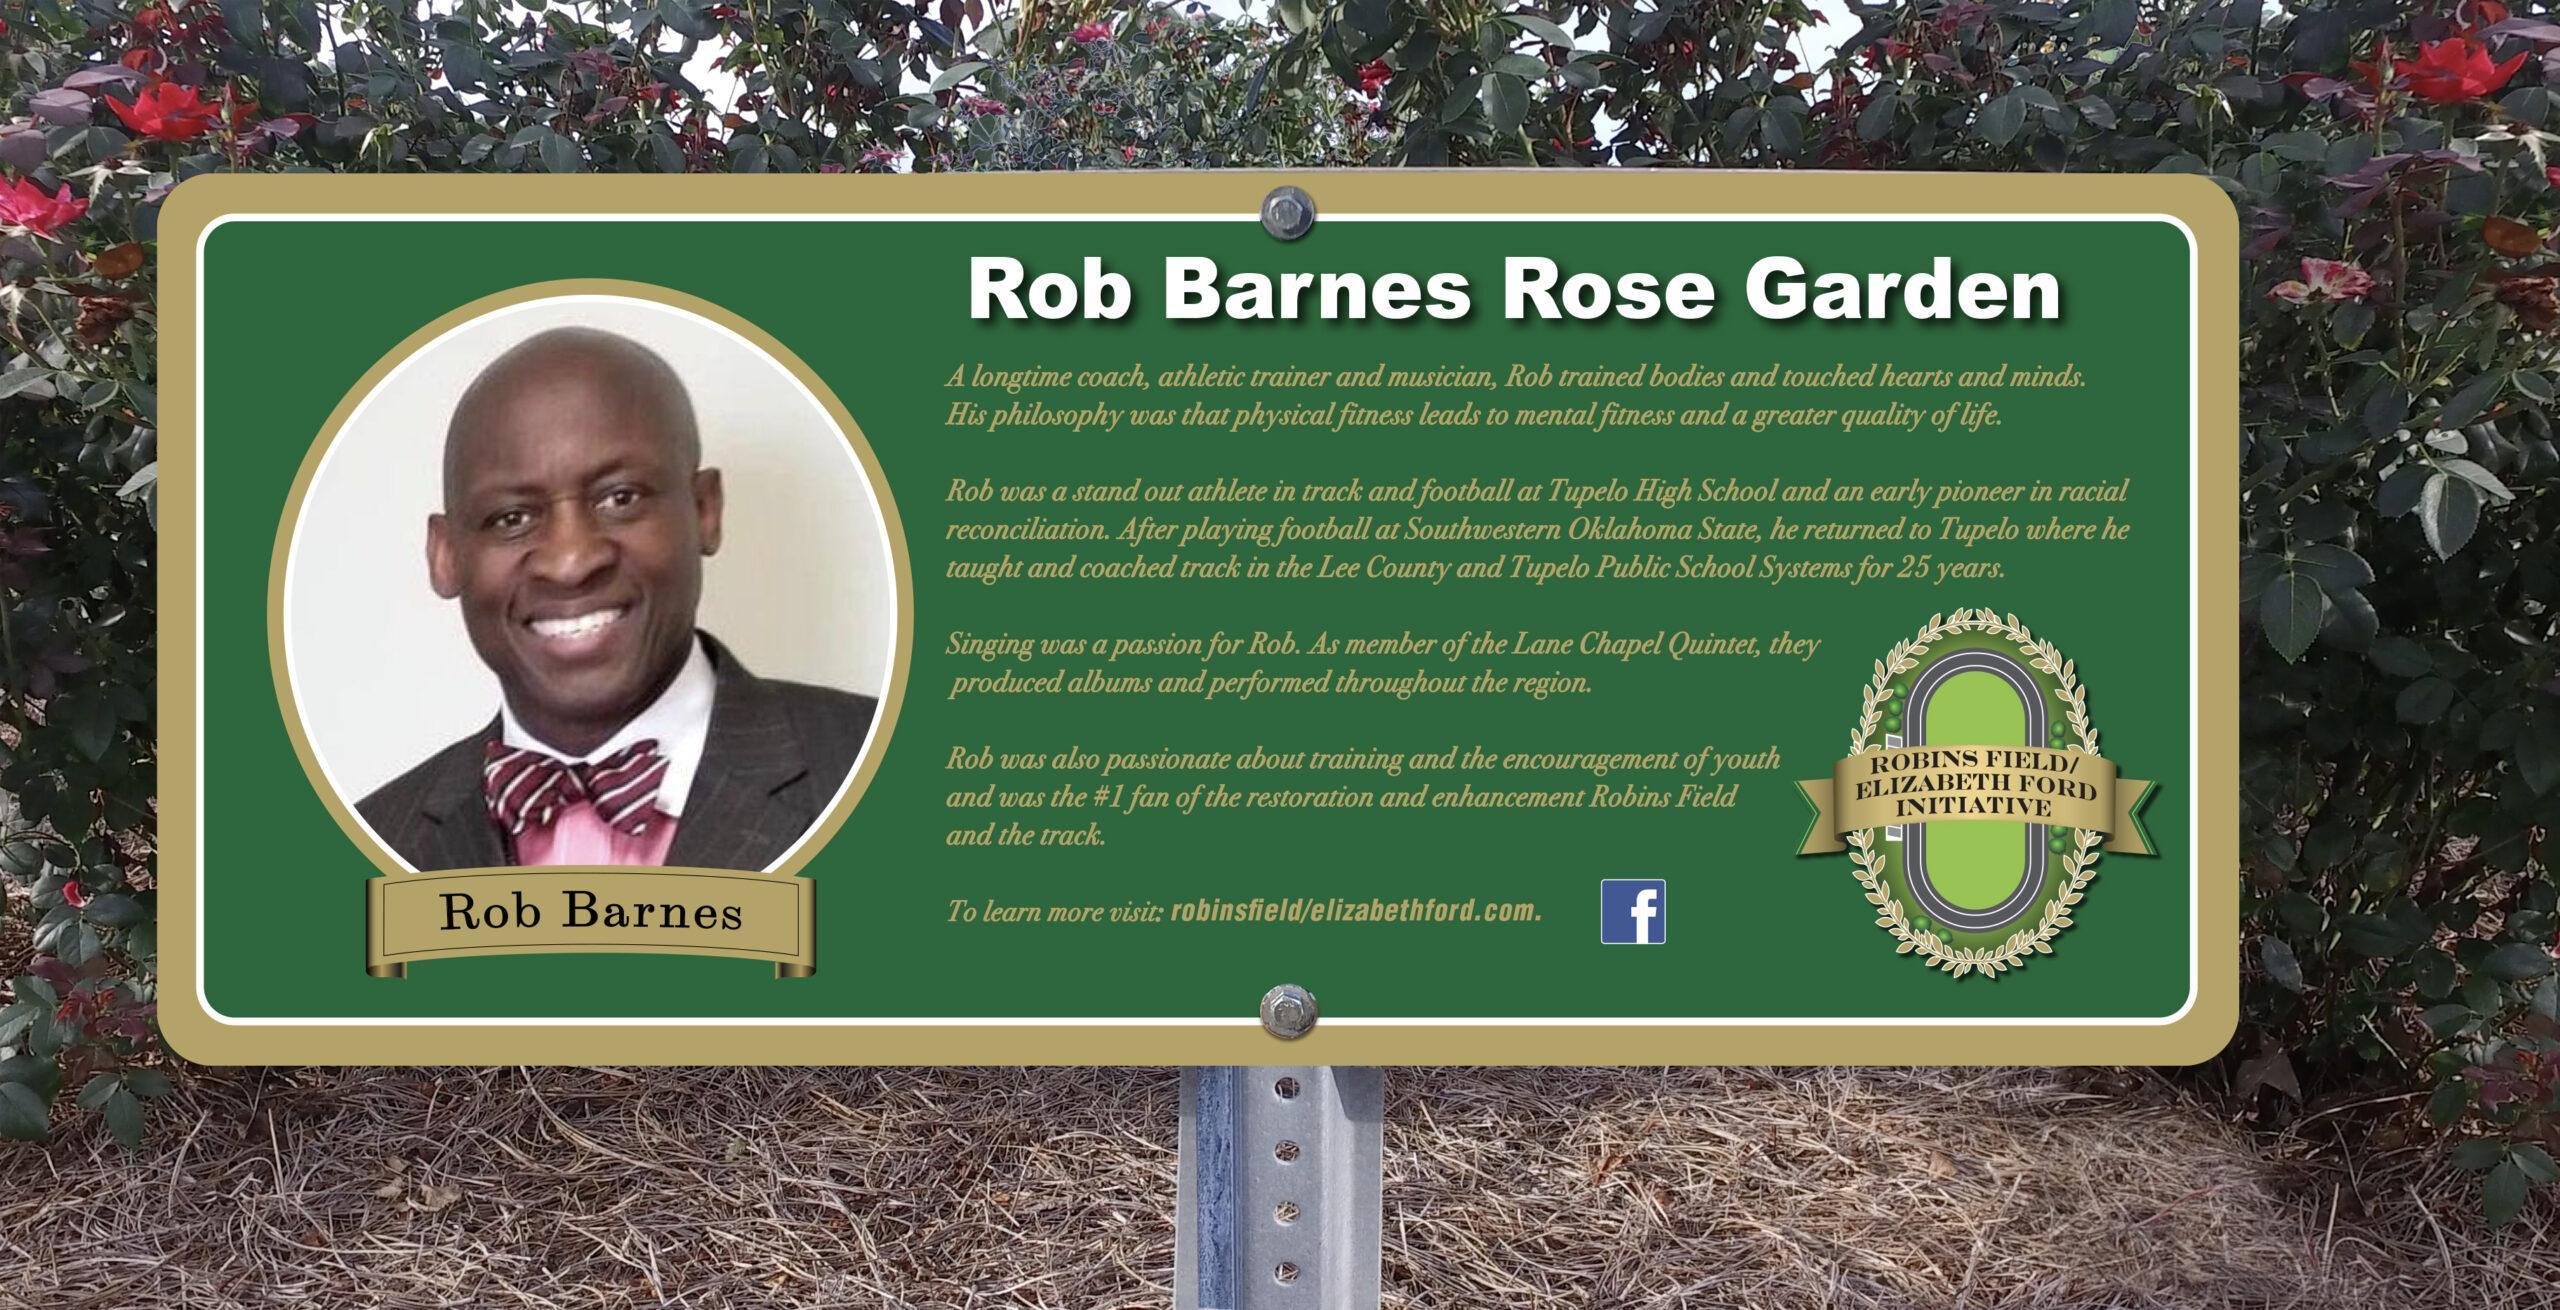 Ken Kirk Rose Garden Sign